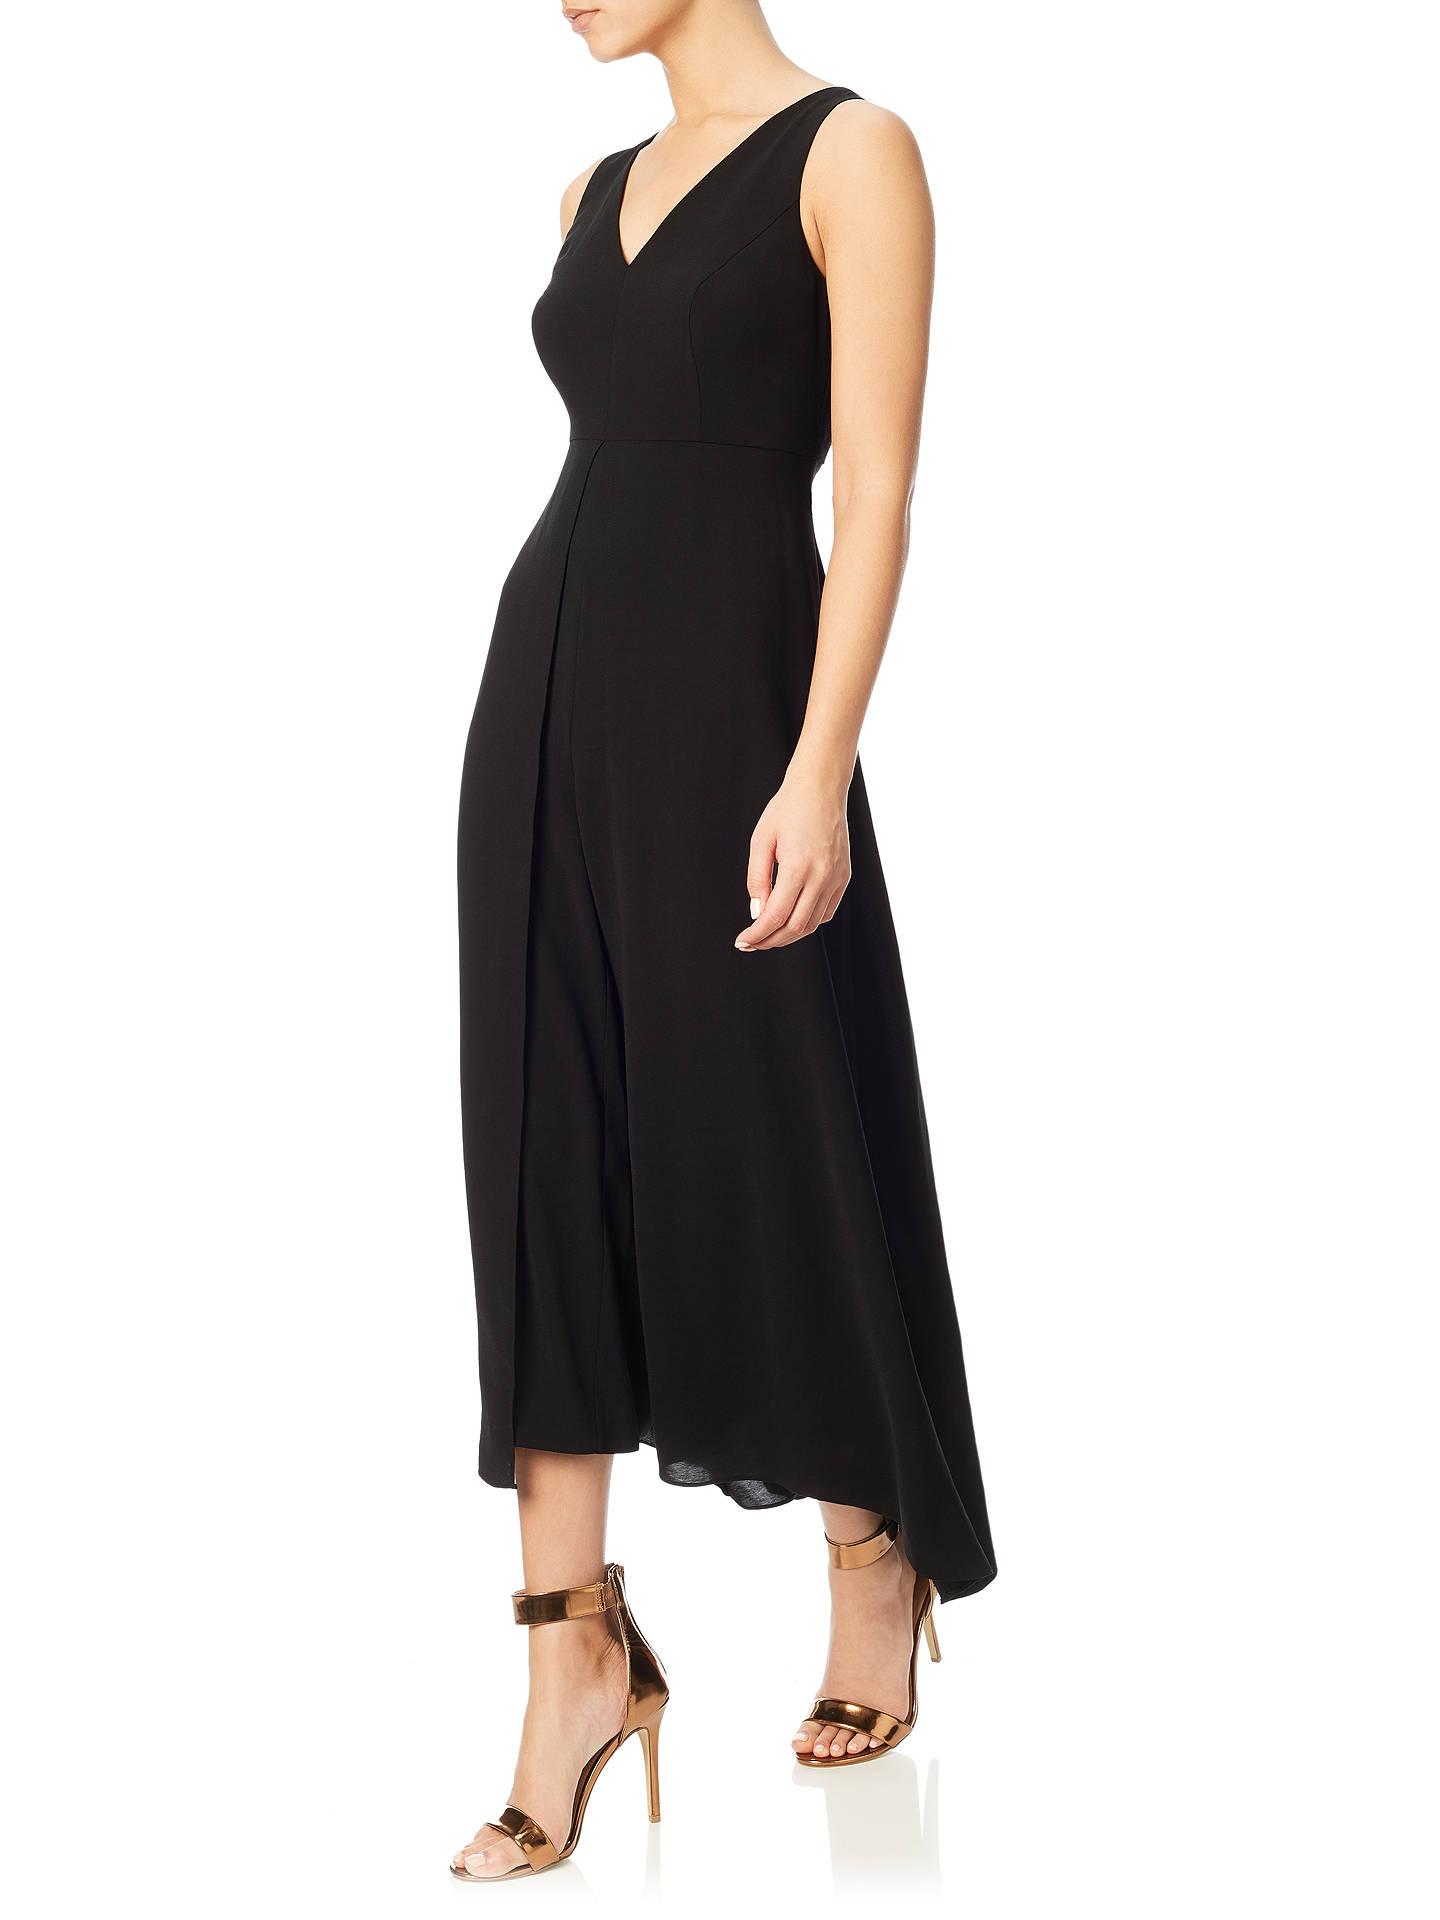 f78539fda2d0 Buy Adrianna Papell Tonal Overlay Jumpsuit